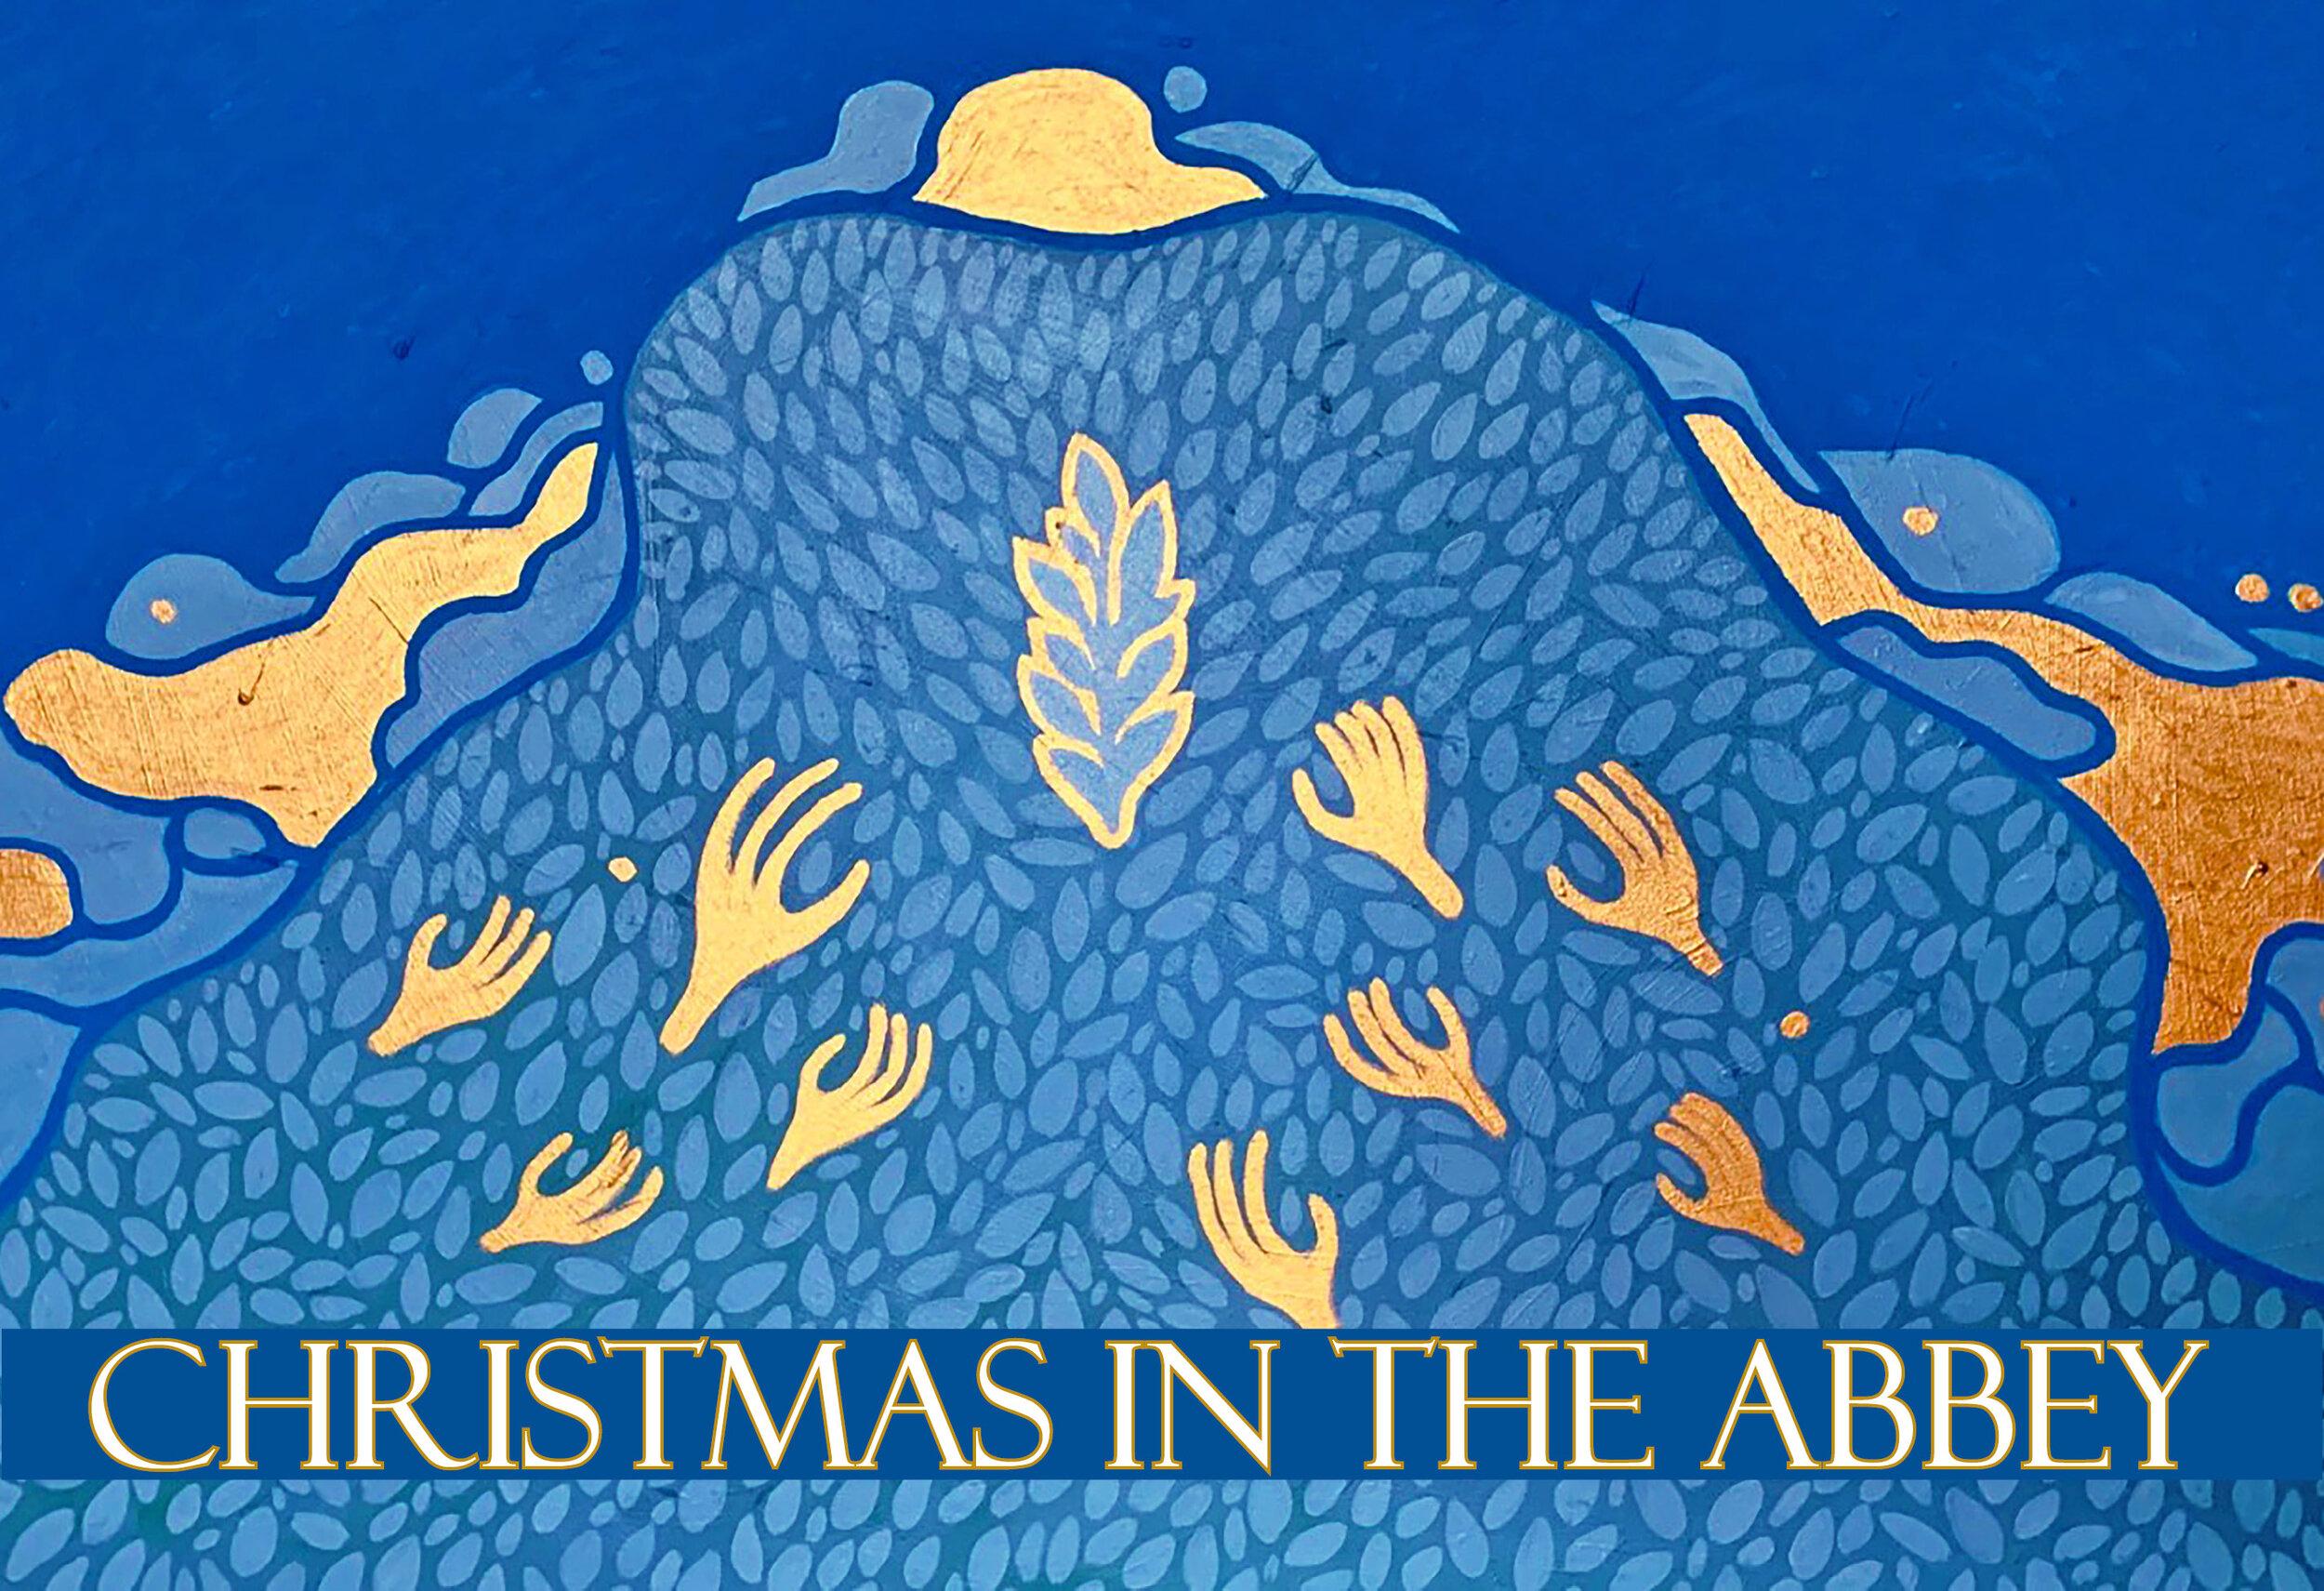 Christmas in the Abbey 9 x 6 postcard.jpg